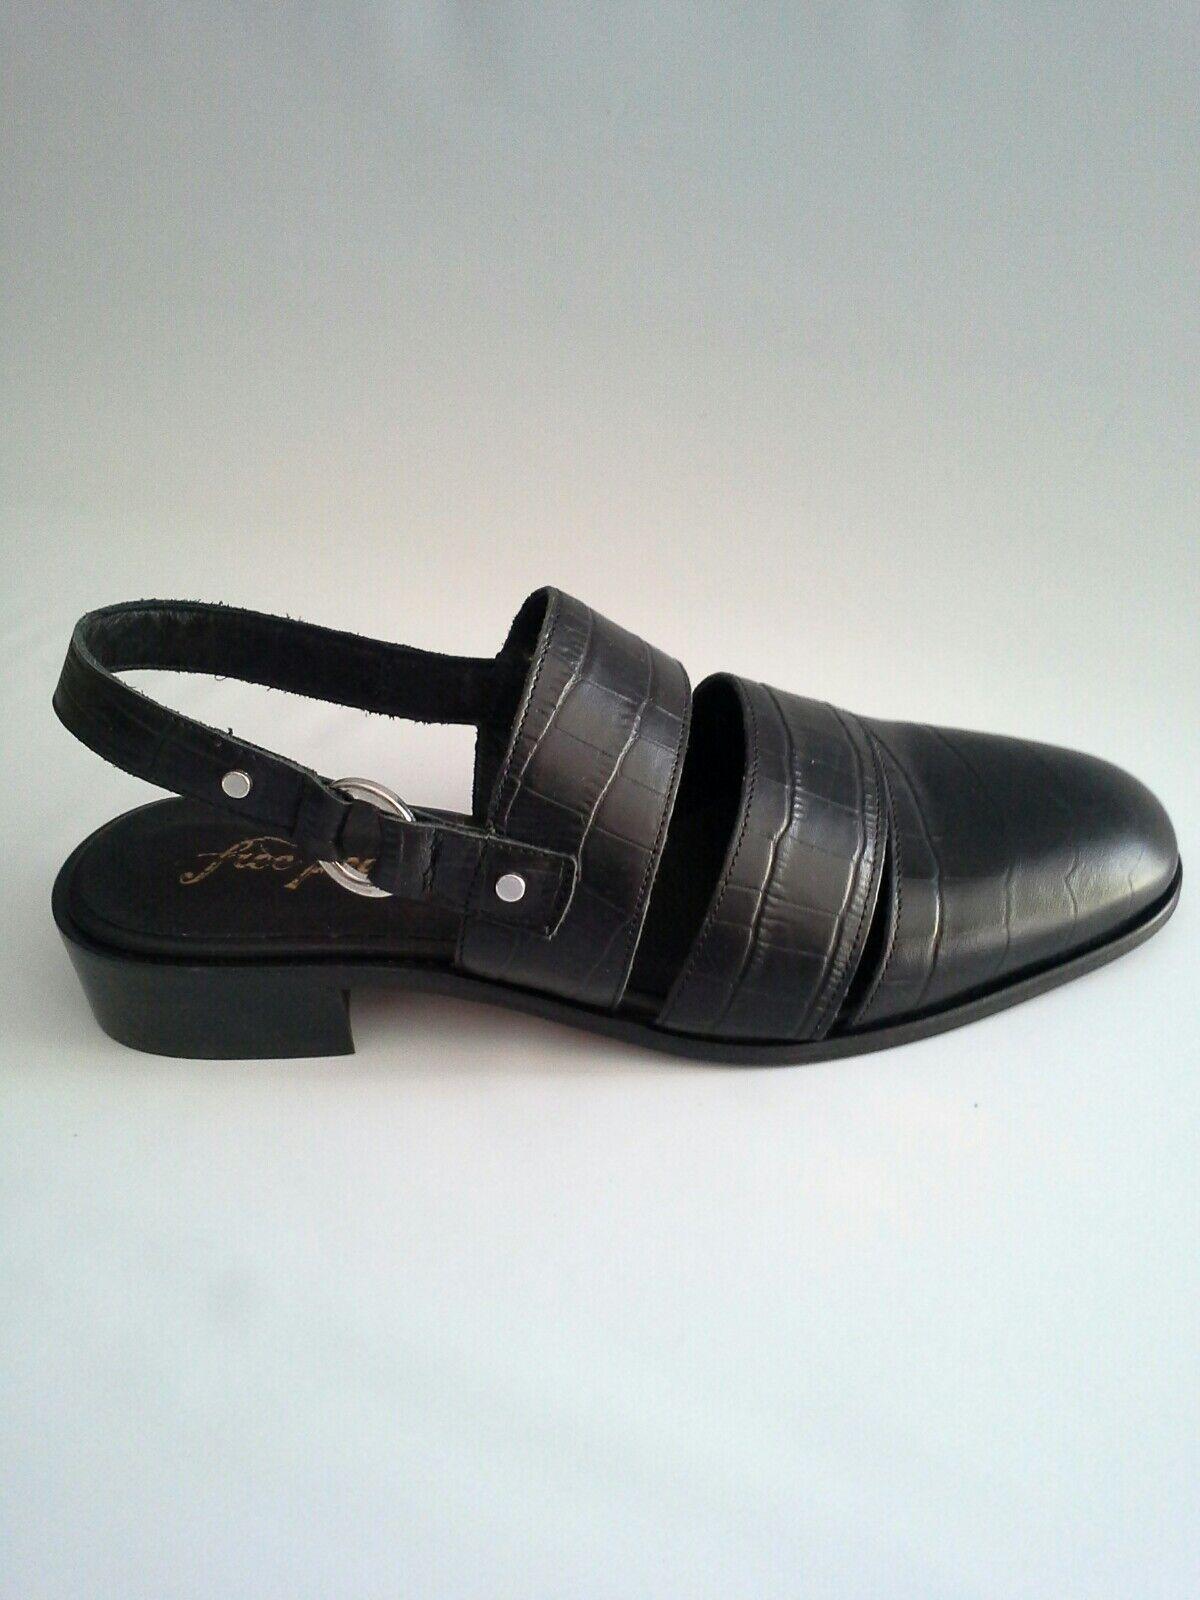 Free People Runaway Slingback Loafer Sandal Embossed Leather Black Black Black Sz 39  138 96eaea